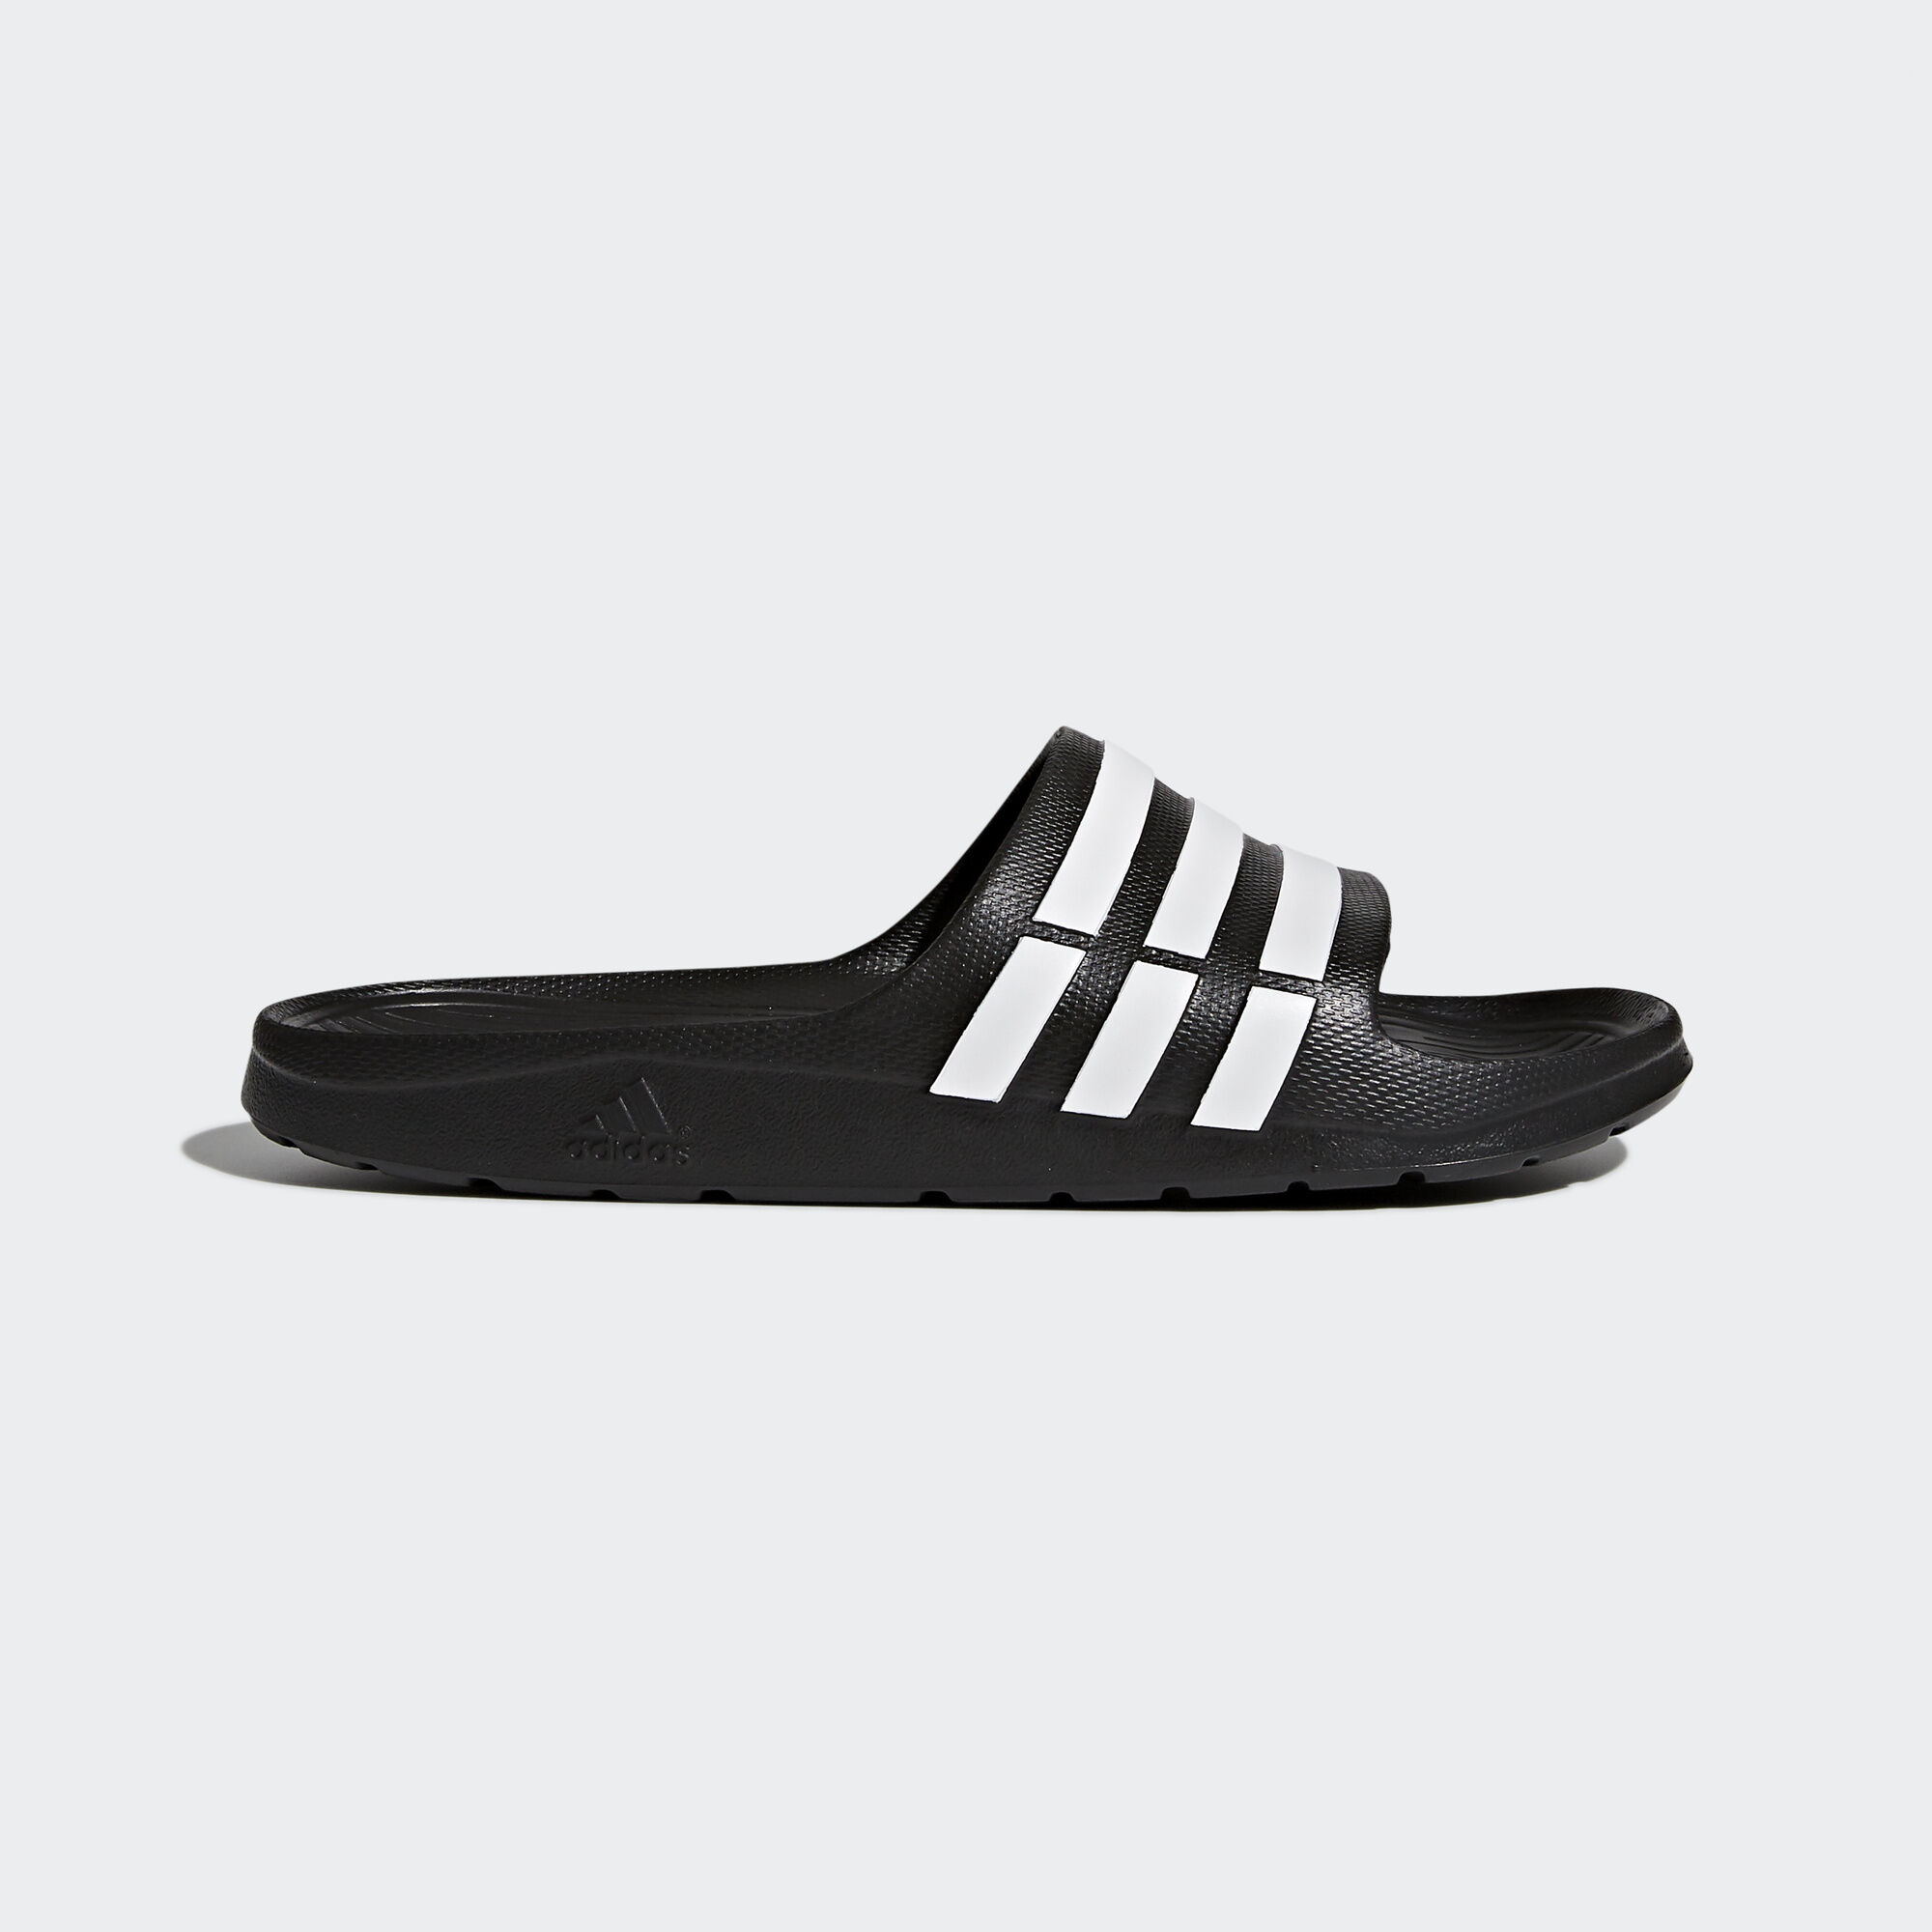 adidas - Duramo Slide Core Black/White G15890. Swimming